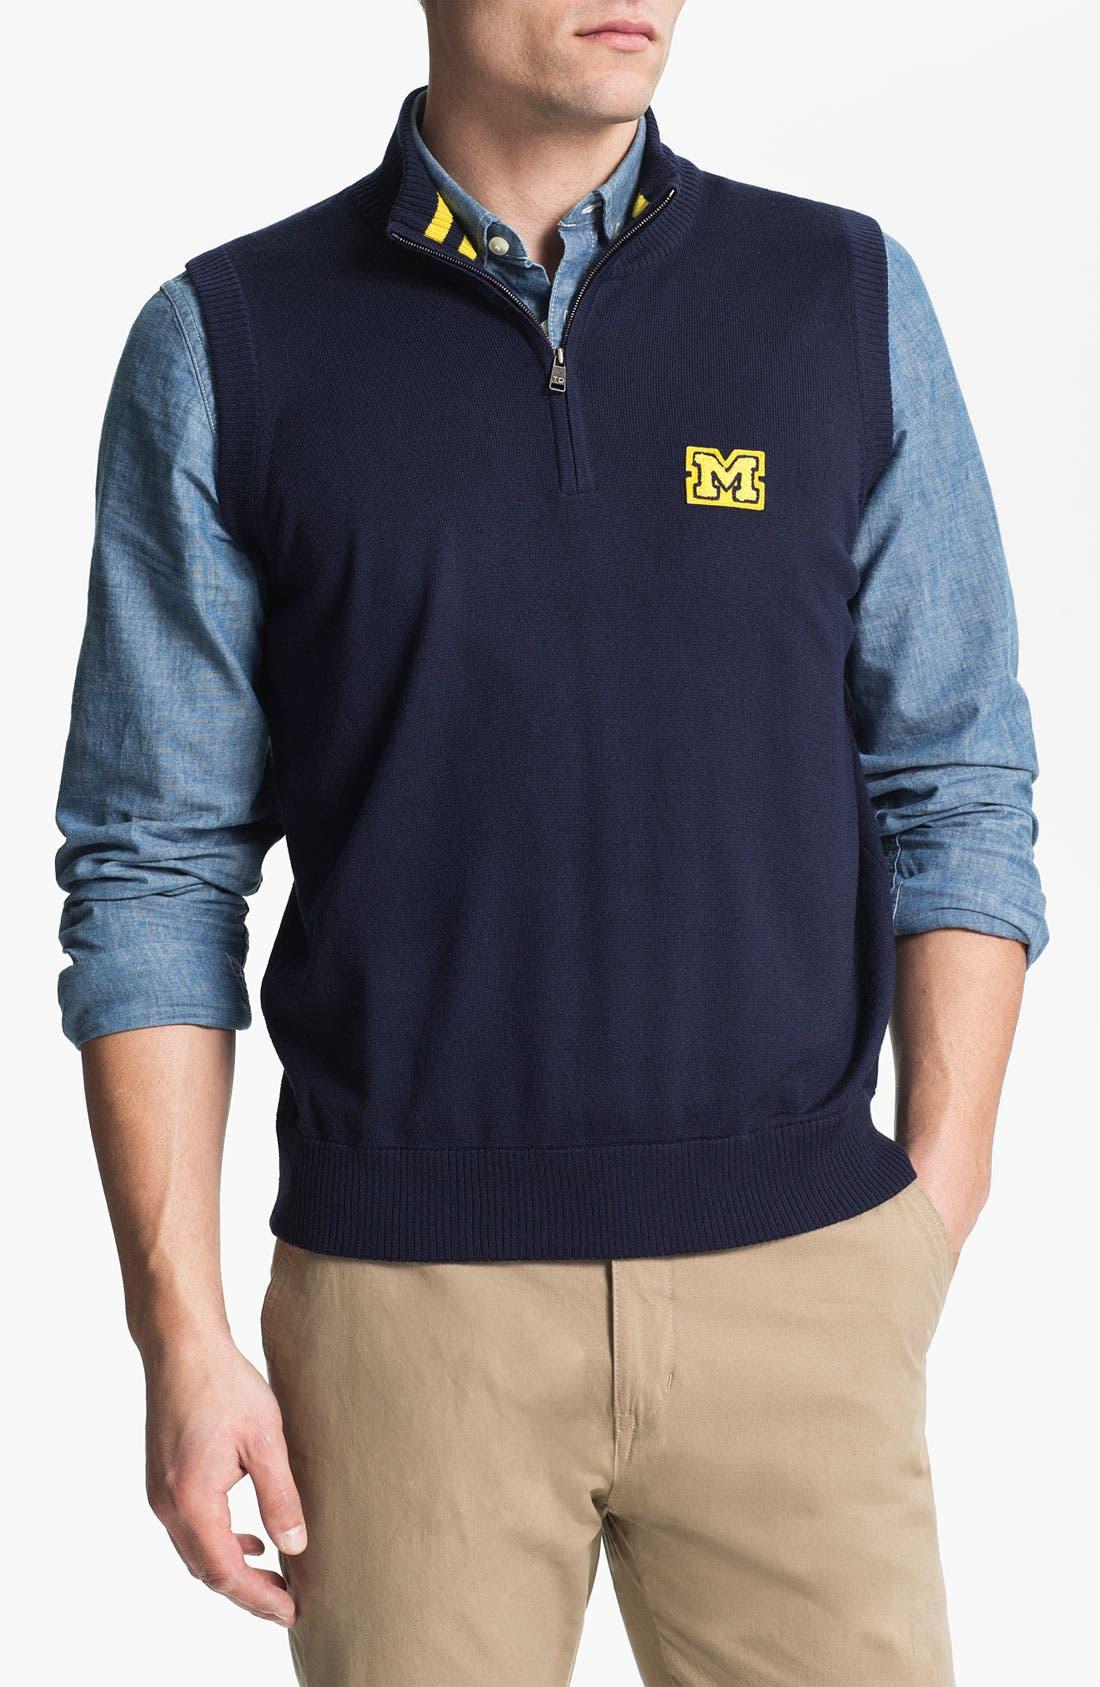 Alternate Image 1 Selected - Thomas Dean 'Michigan' Quarter Zip Sweater Vest